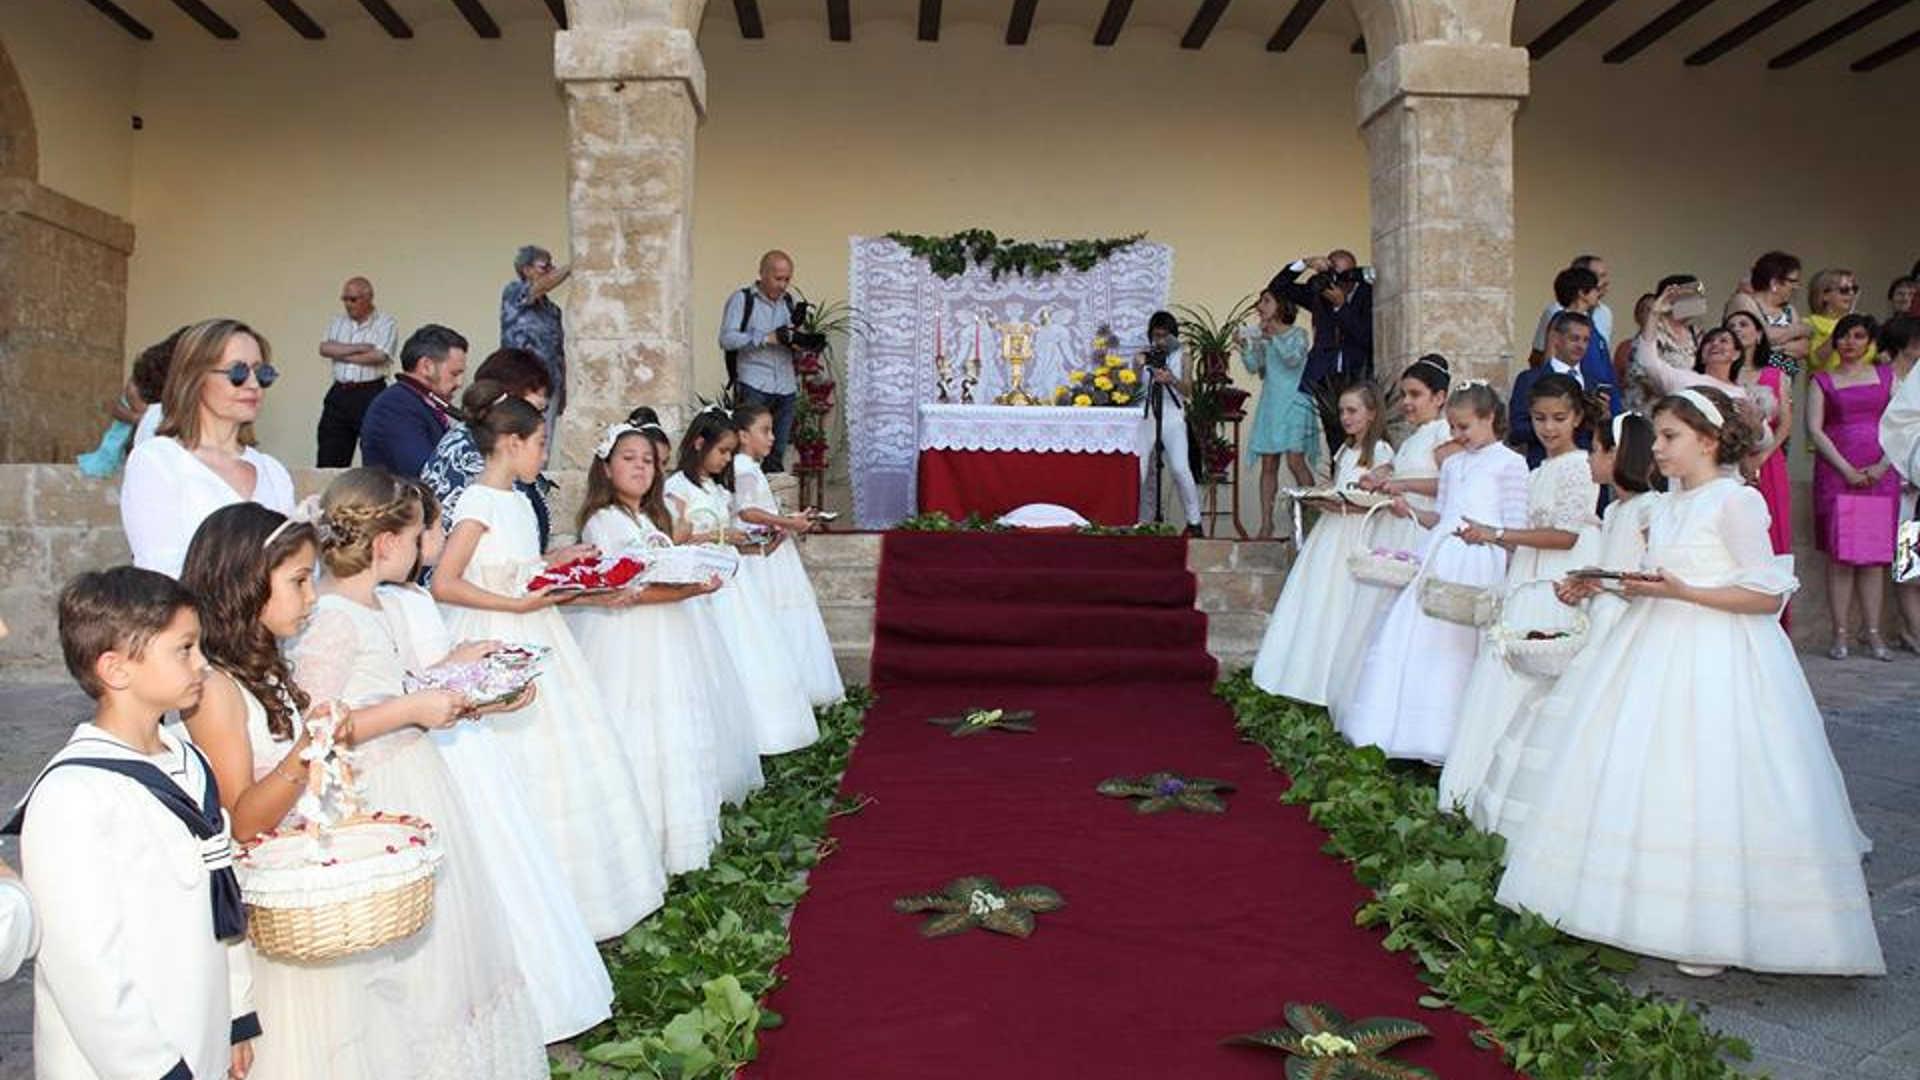 LA FÊTE DU CORPUS CHRISTI À TEULADA - MORAIRA